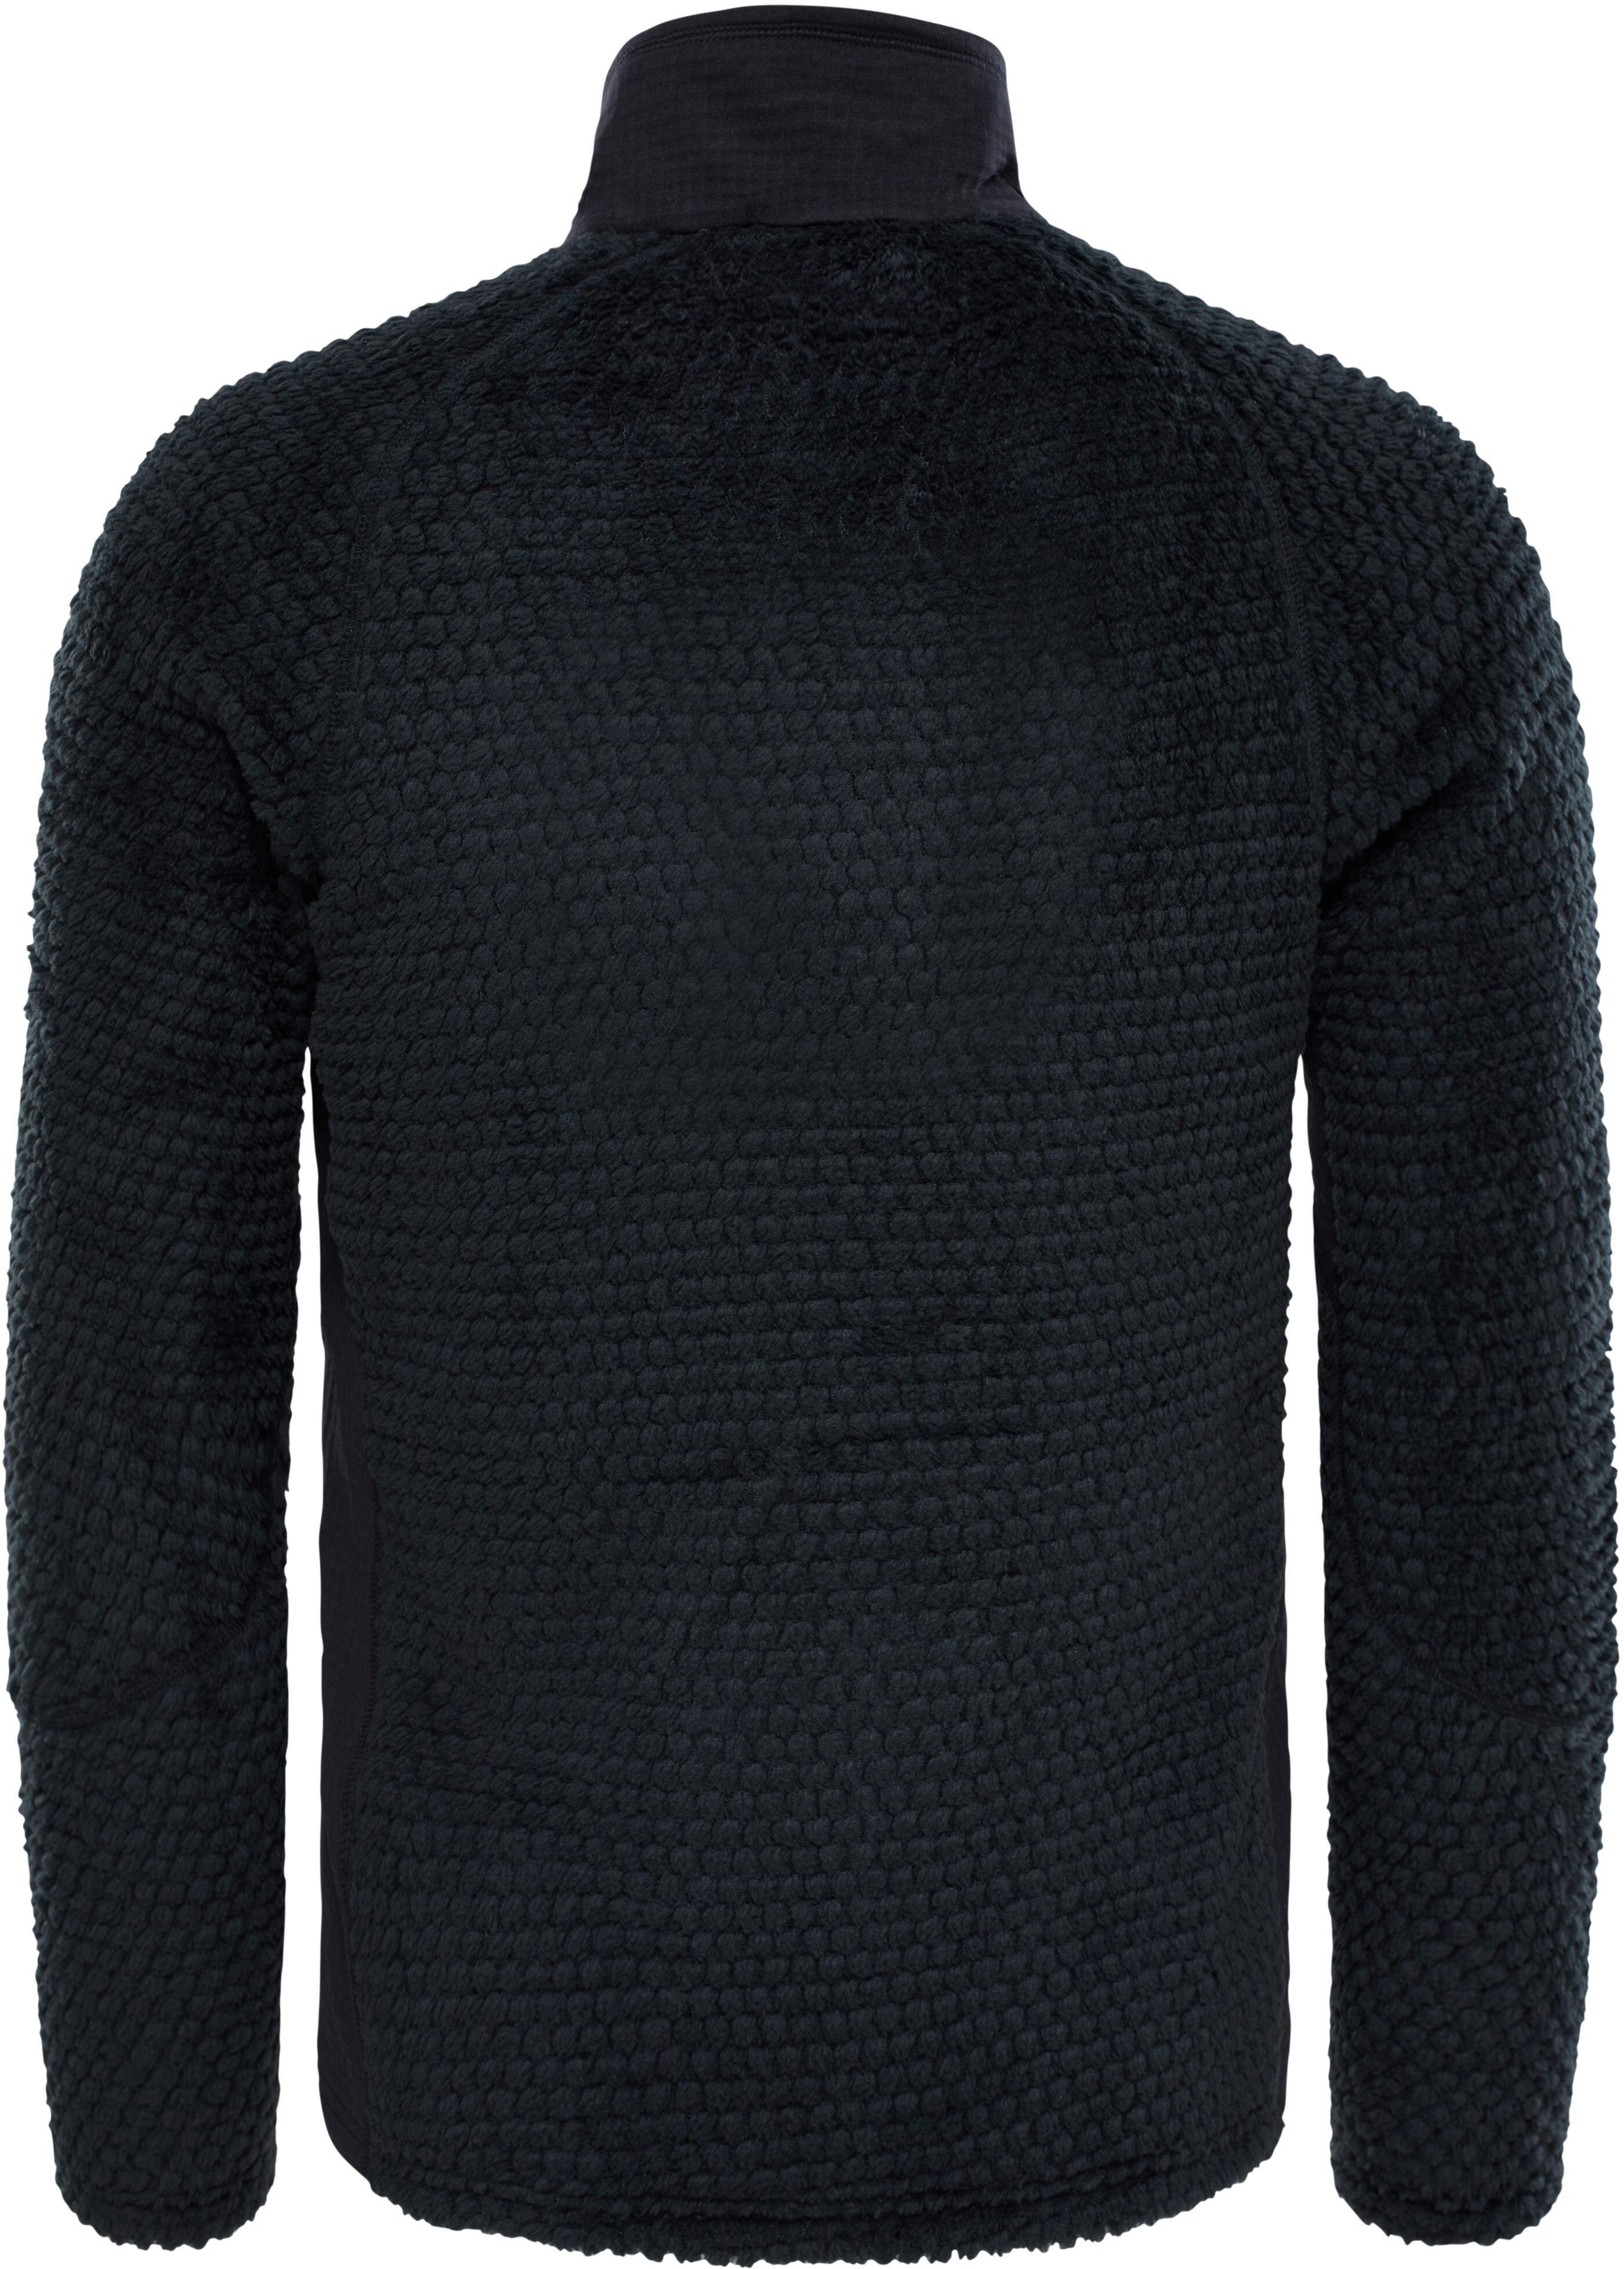 The North Face Radium Hi Loft Fleece Sweatshirt Herr Black